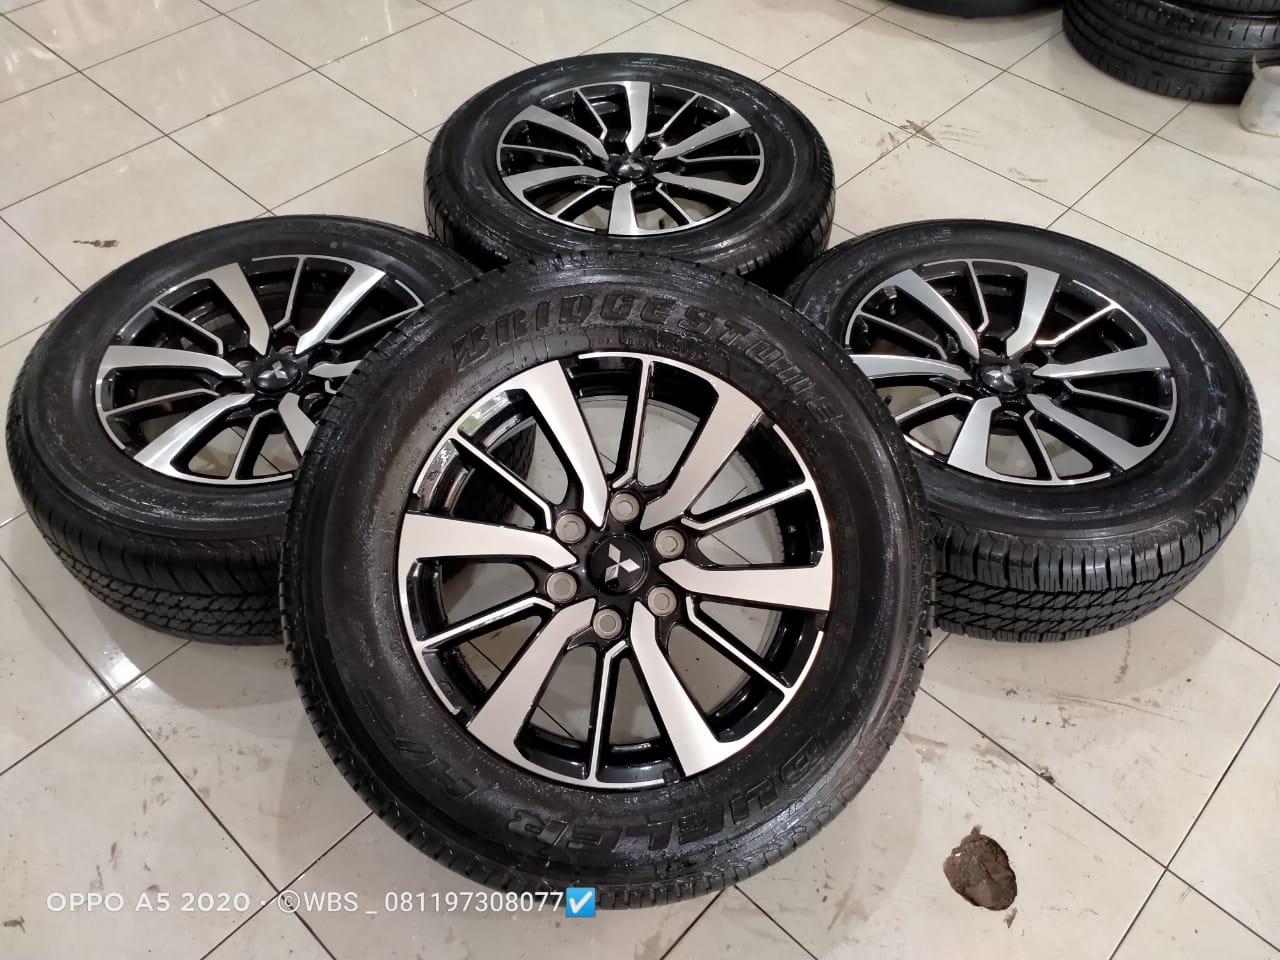 di jual velg mobil new pajero ring 18 + ban brigston 265-60 kondisi velg dan ban 95% thun 2019